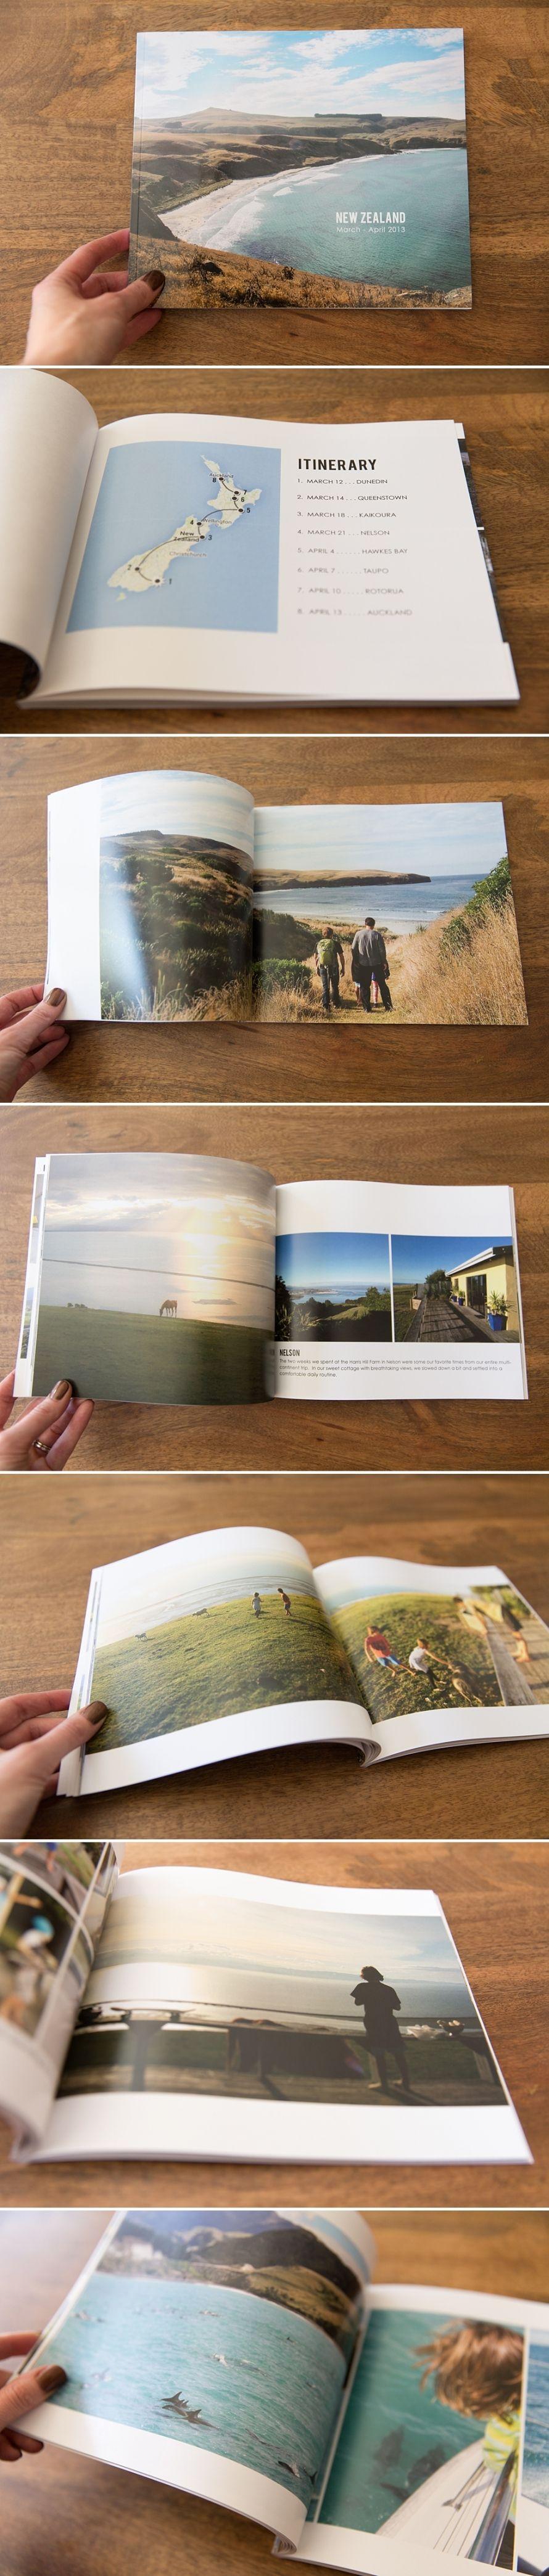 Ideen f r ein fotobuch photobook layout ideas for Fotobuch ideen